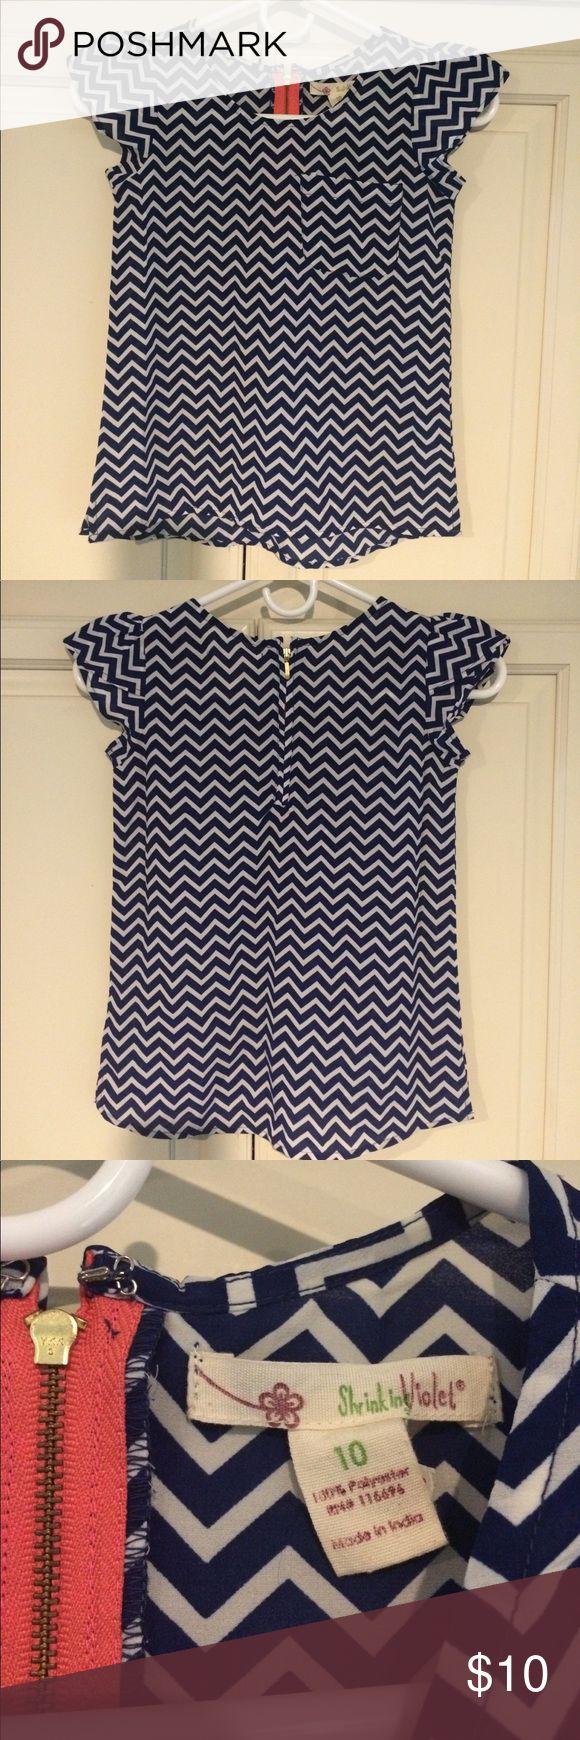 Girls Shrinking Violet Blue Chevron Shirt 10 Girls Shrinking Violet Blue Chevron Shirt 10 Shrinking Violet Shirts & Tops Blouses